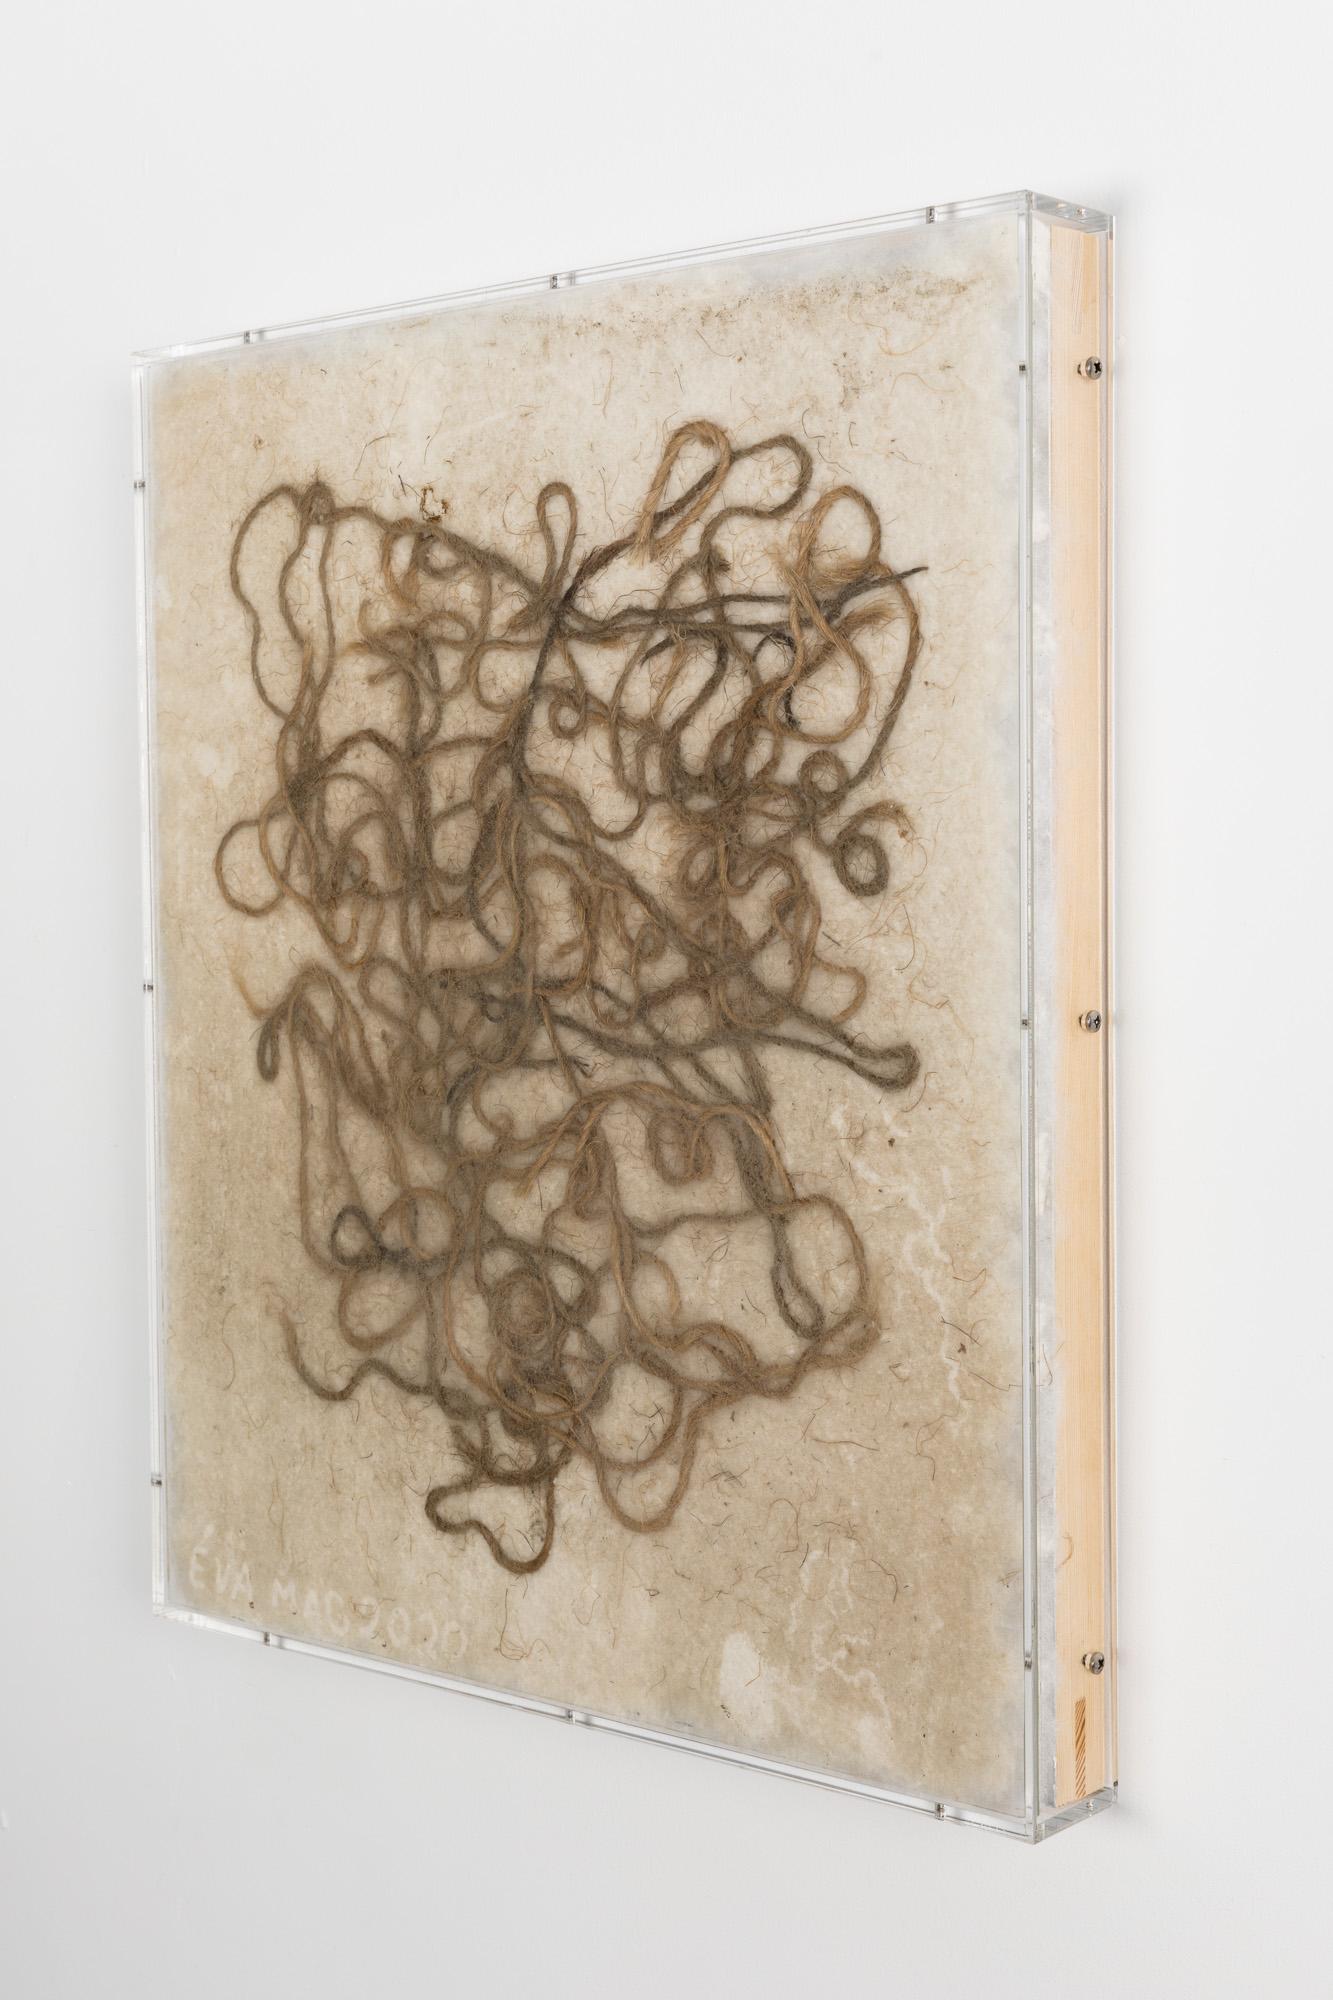 Minimal Information Zsinór, 2020. Hempstring on wadding in artist's frame (plexiglass, wood and aluminum), 61,5 x 51,5 x 6 cm